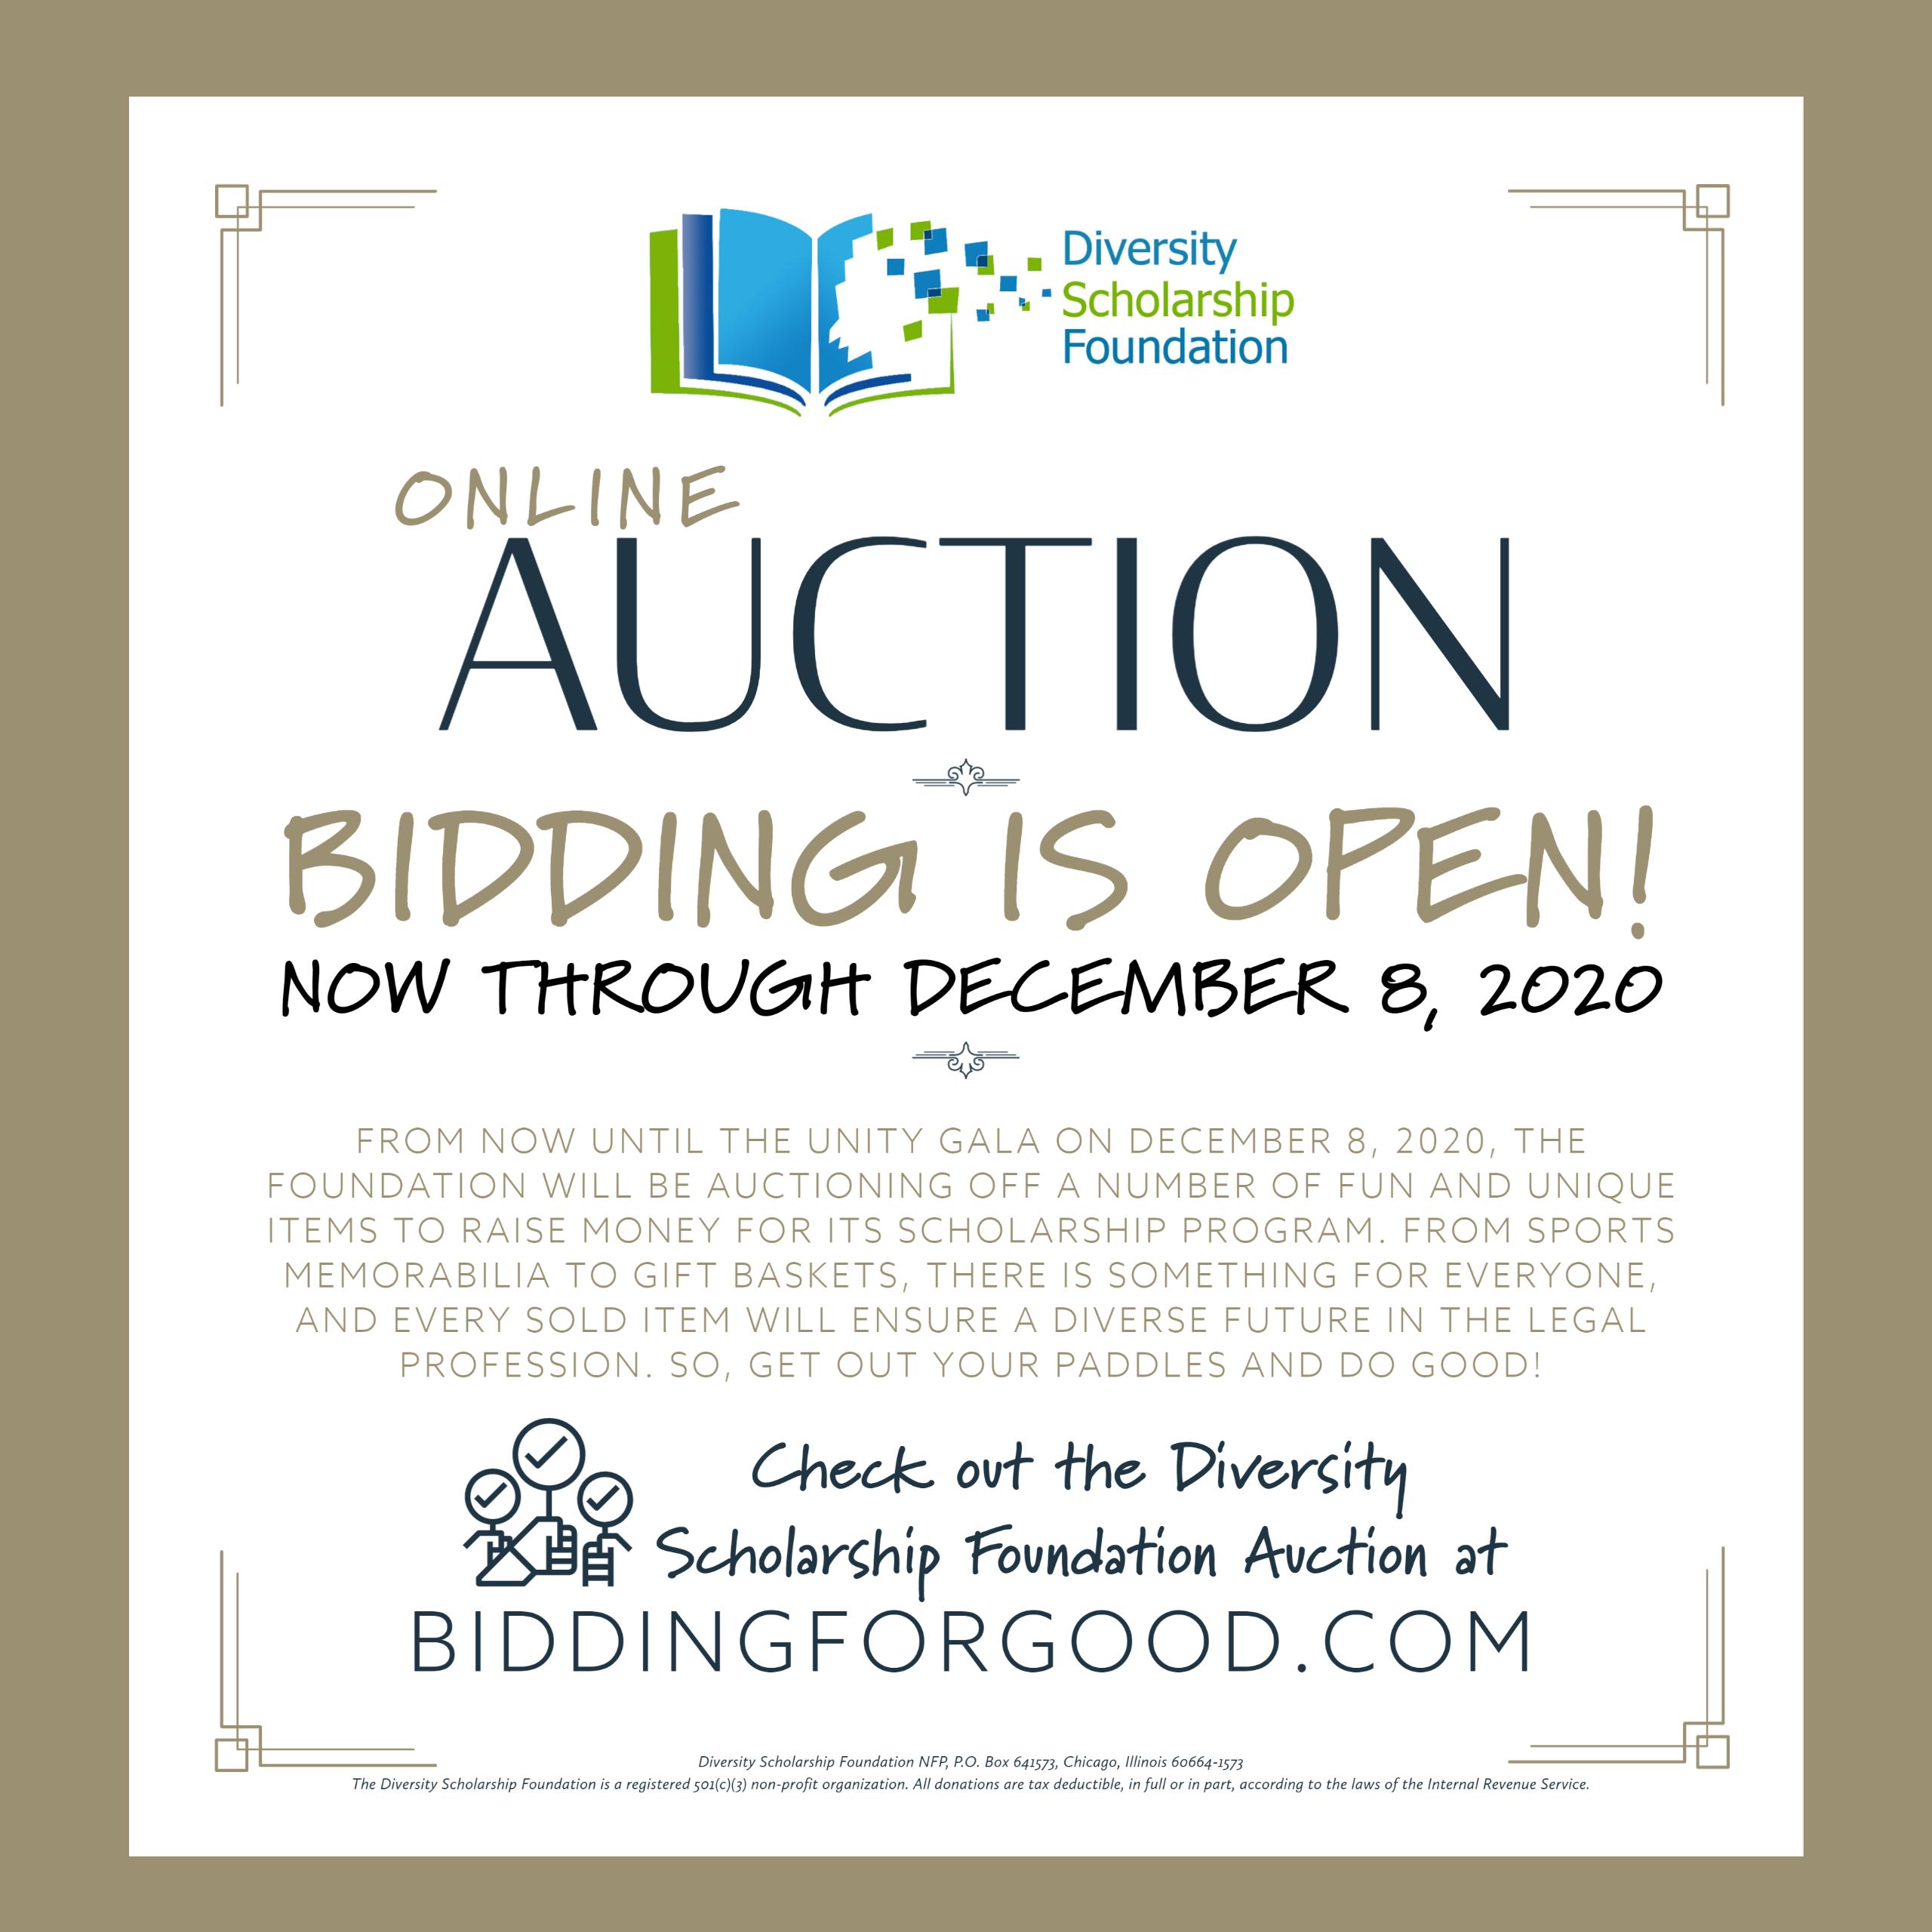 2020 Online Auction Begins!